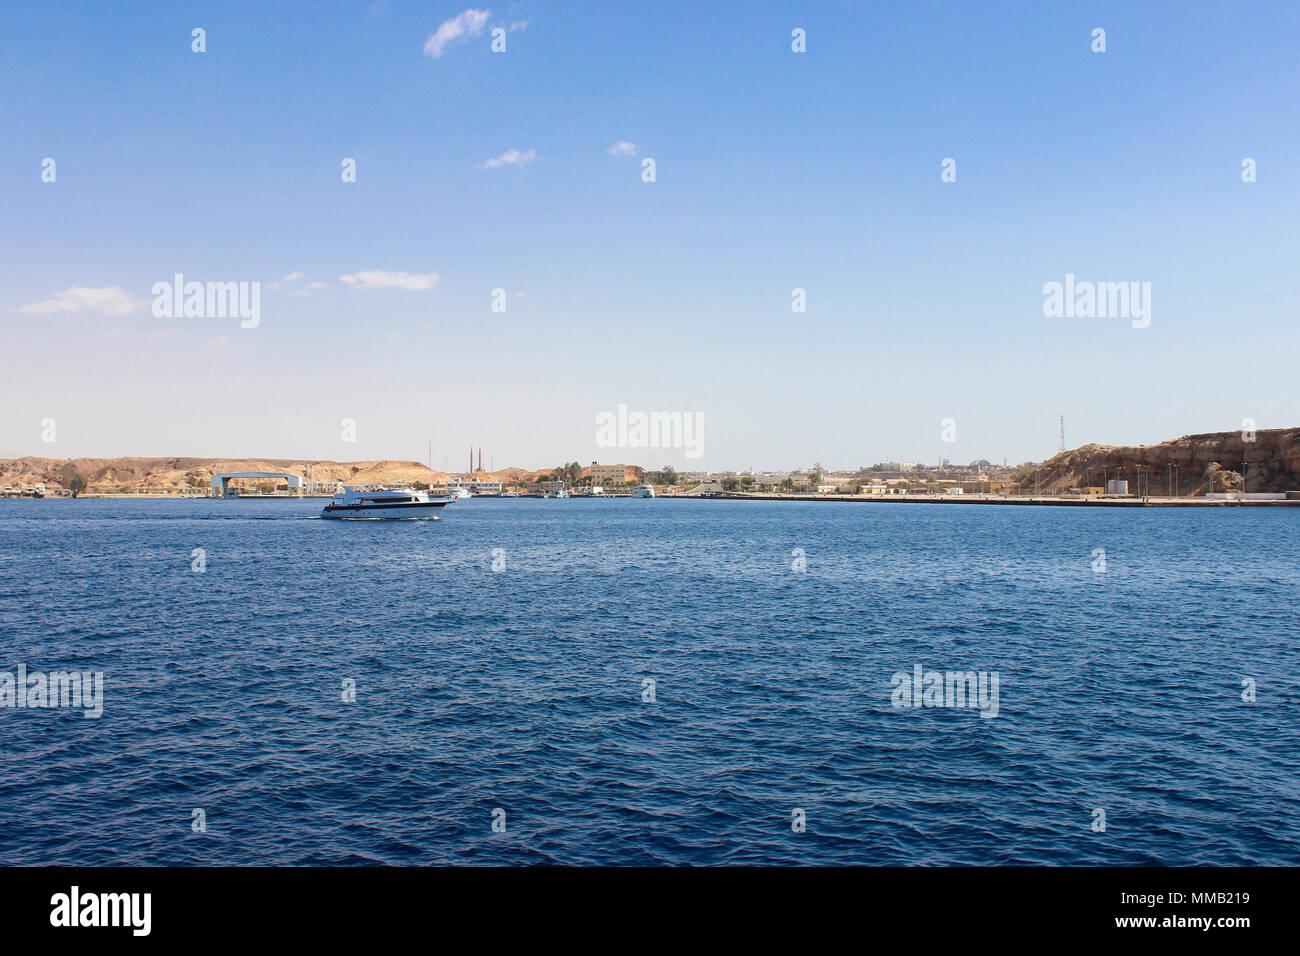 Touristische Bootsfahrt mit Touristen in Rot. Insel Tiran. Stockbild